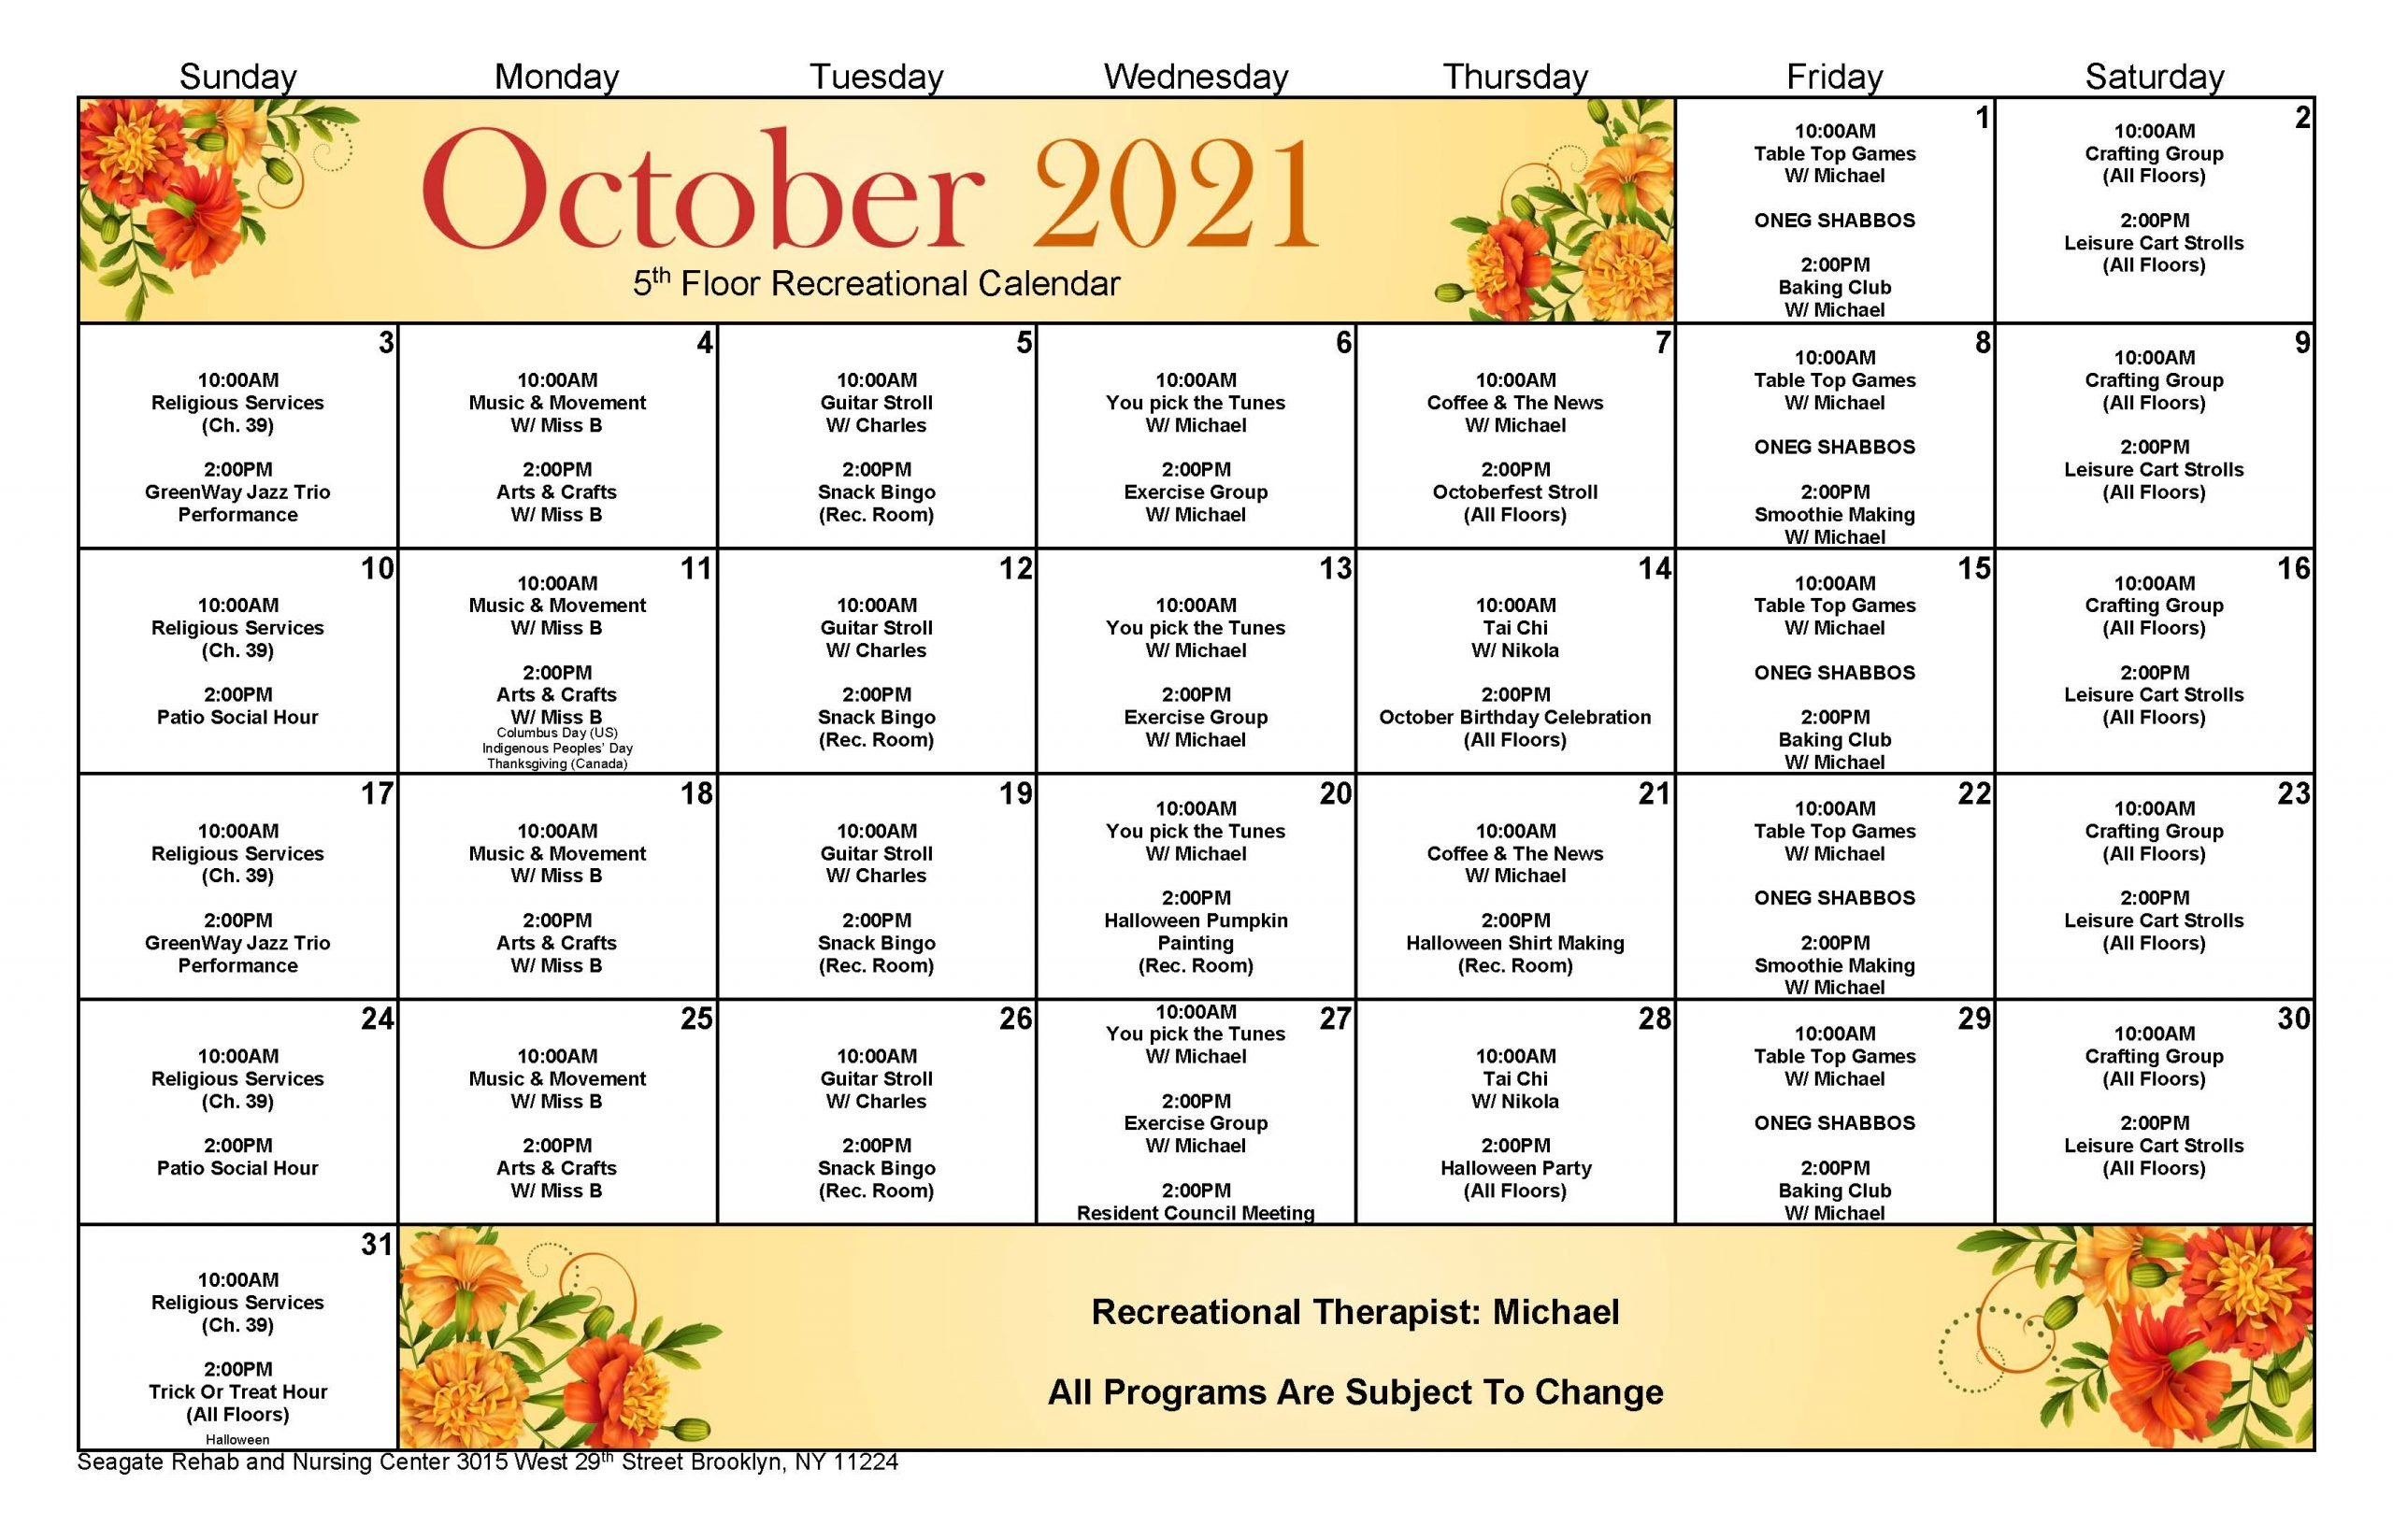 Seagate 5th Floor Event Calendar